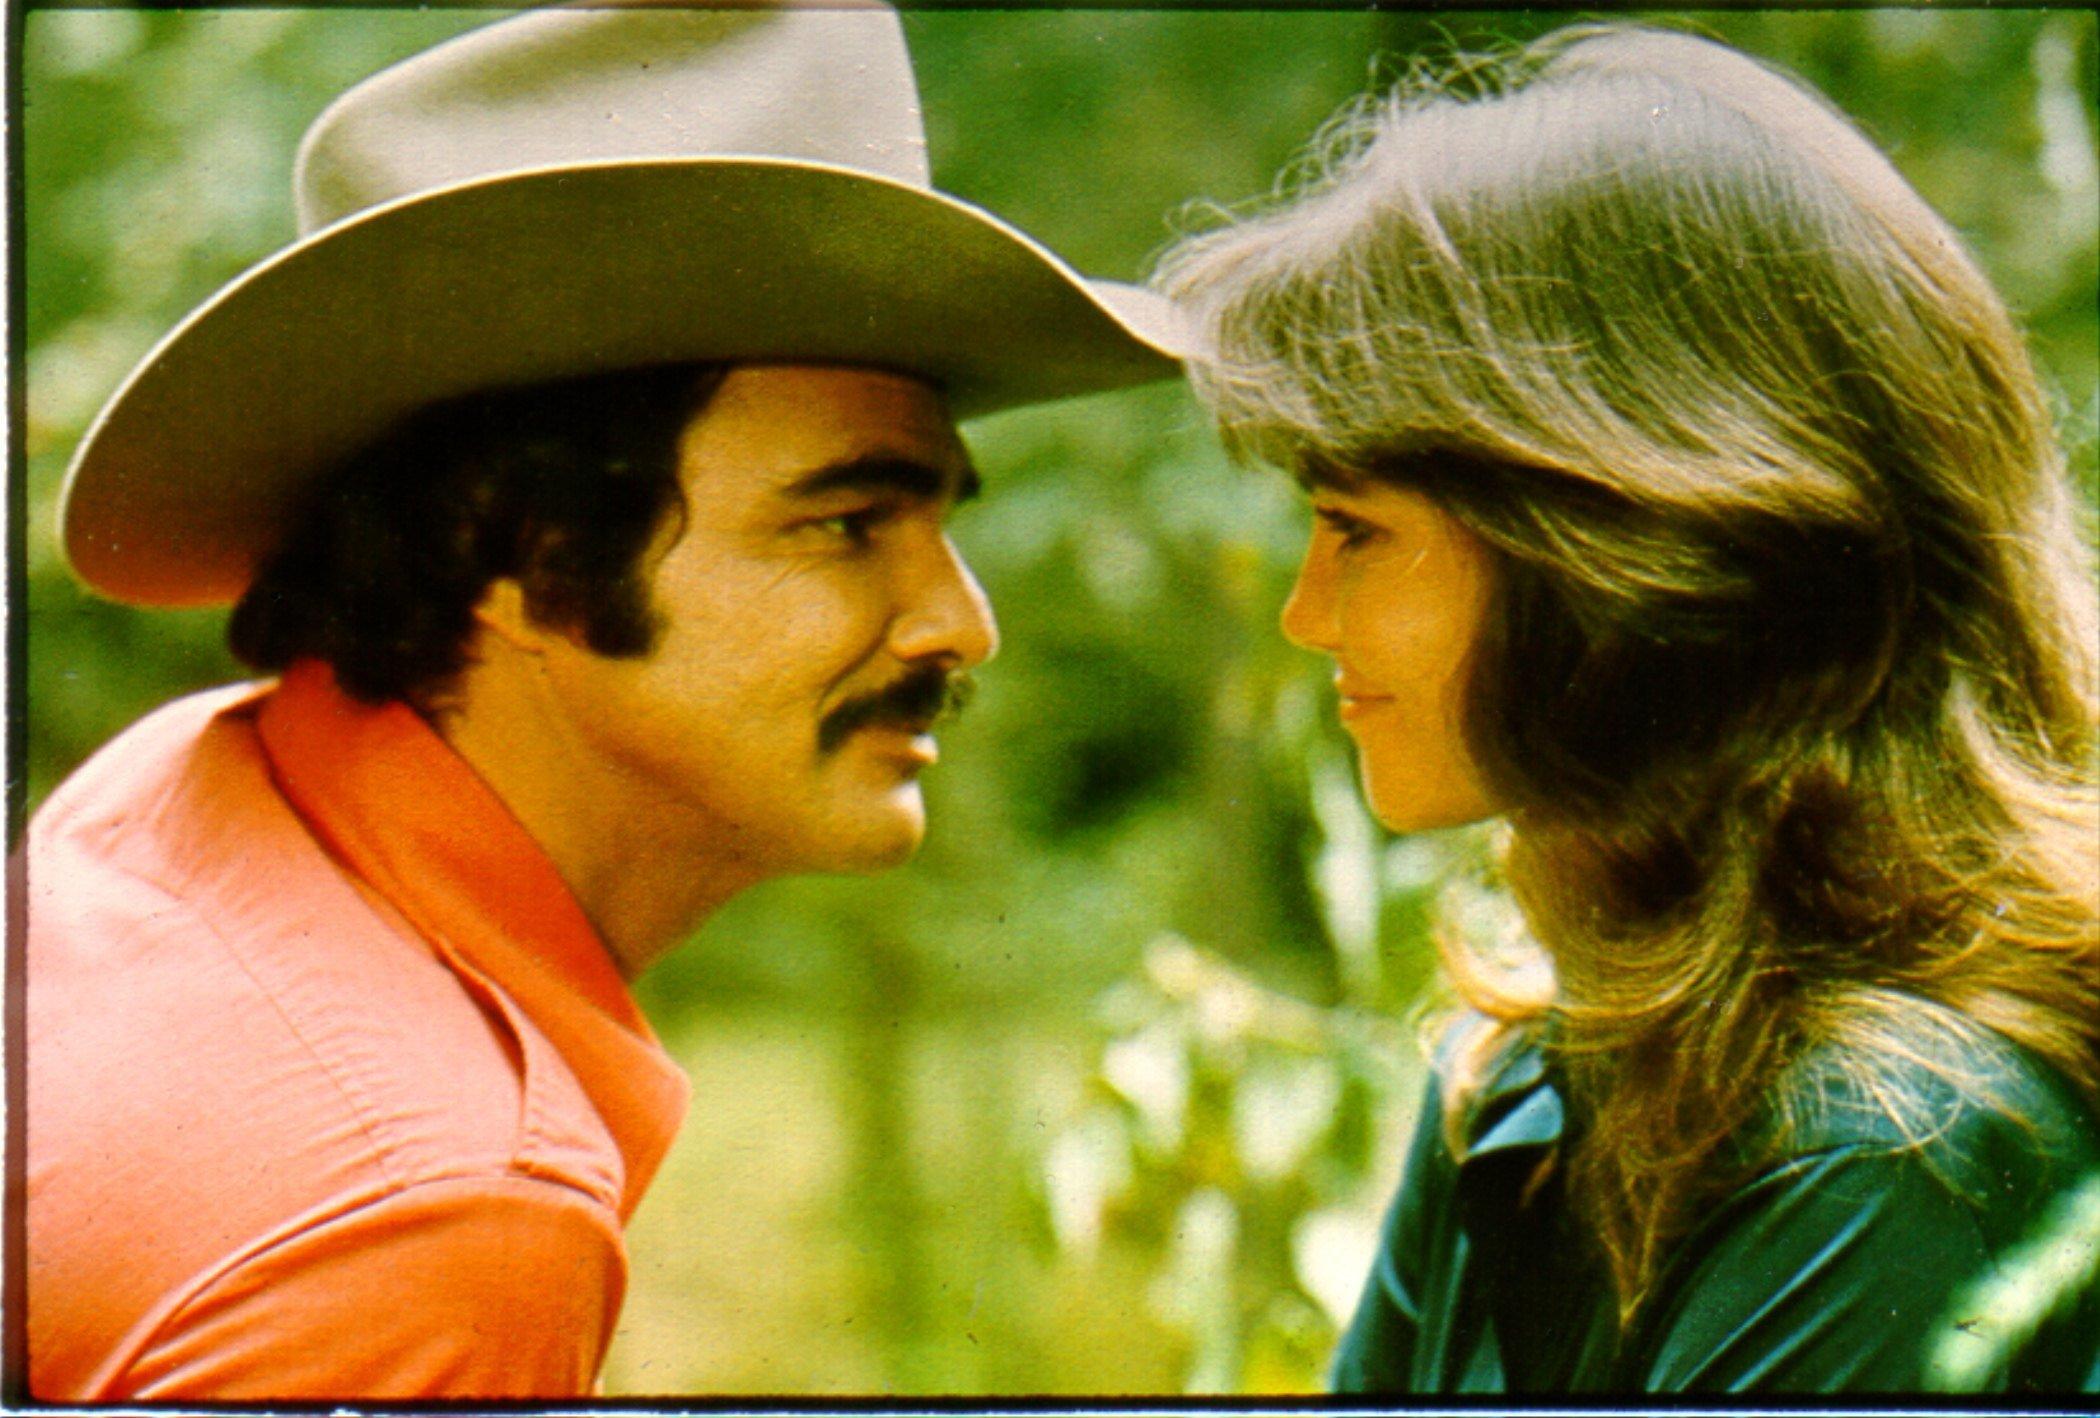 Burt Reynolds & Lee Corso At Florida State